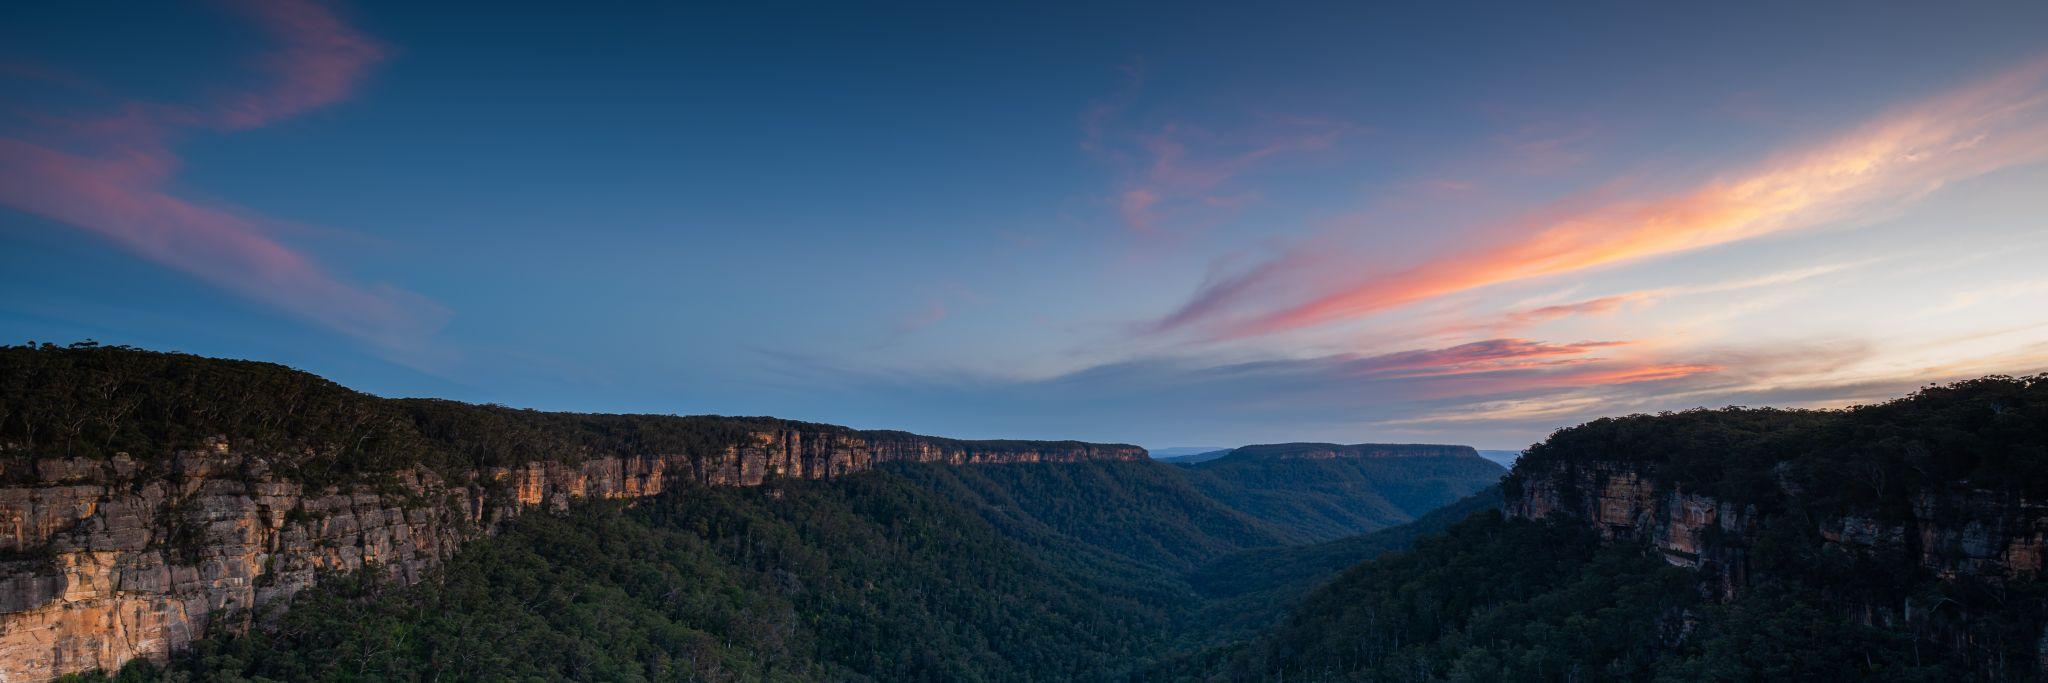 Sunset over the Morton National Park, Australia